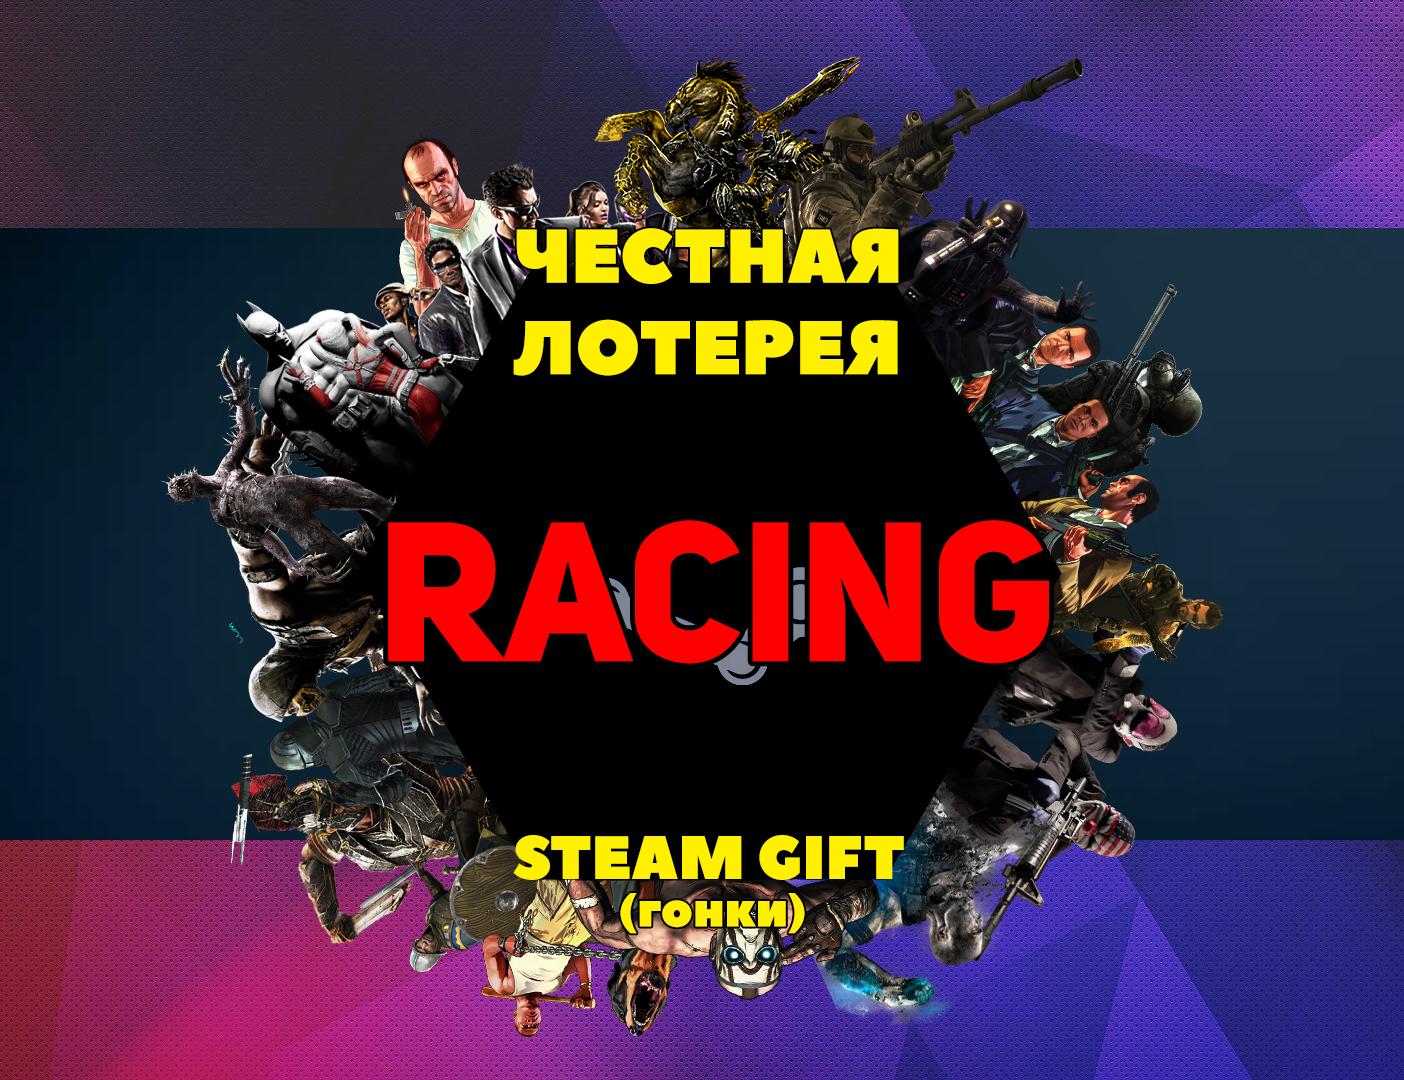 Честная лотерея GIFT Steam [RACING]